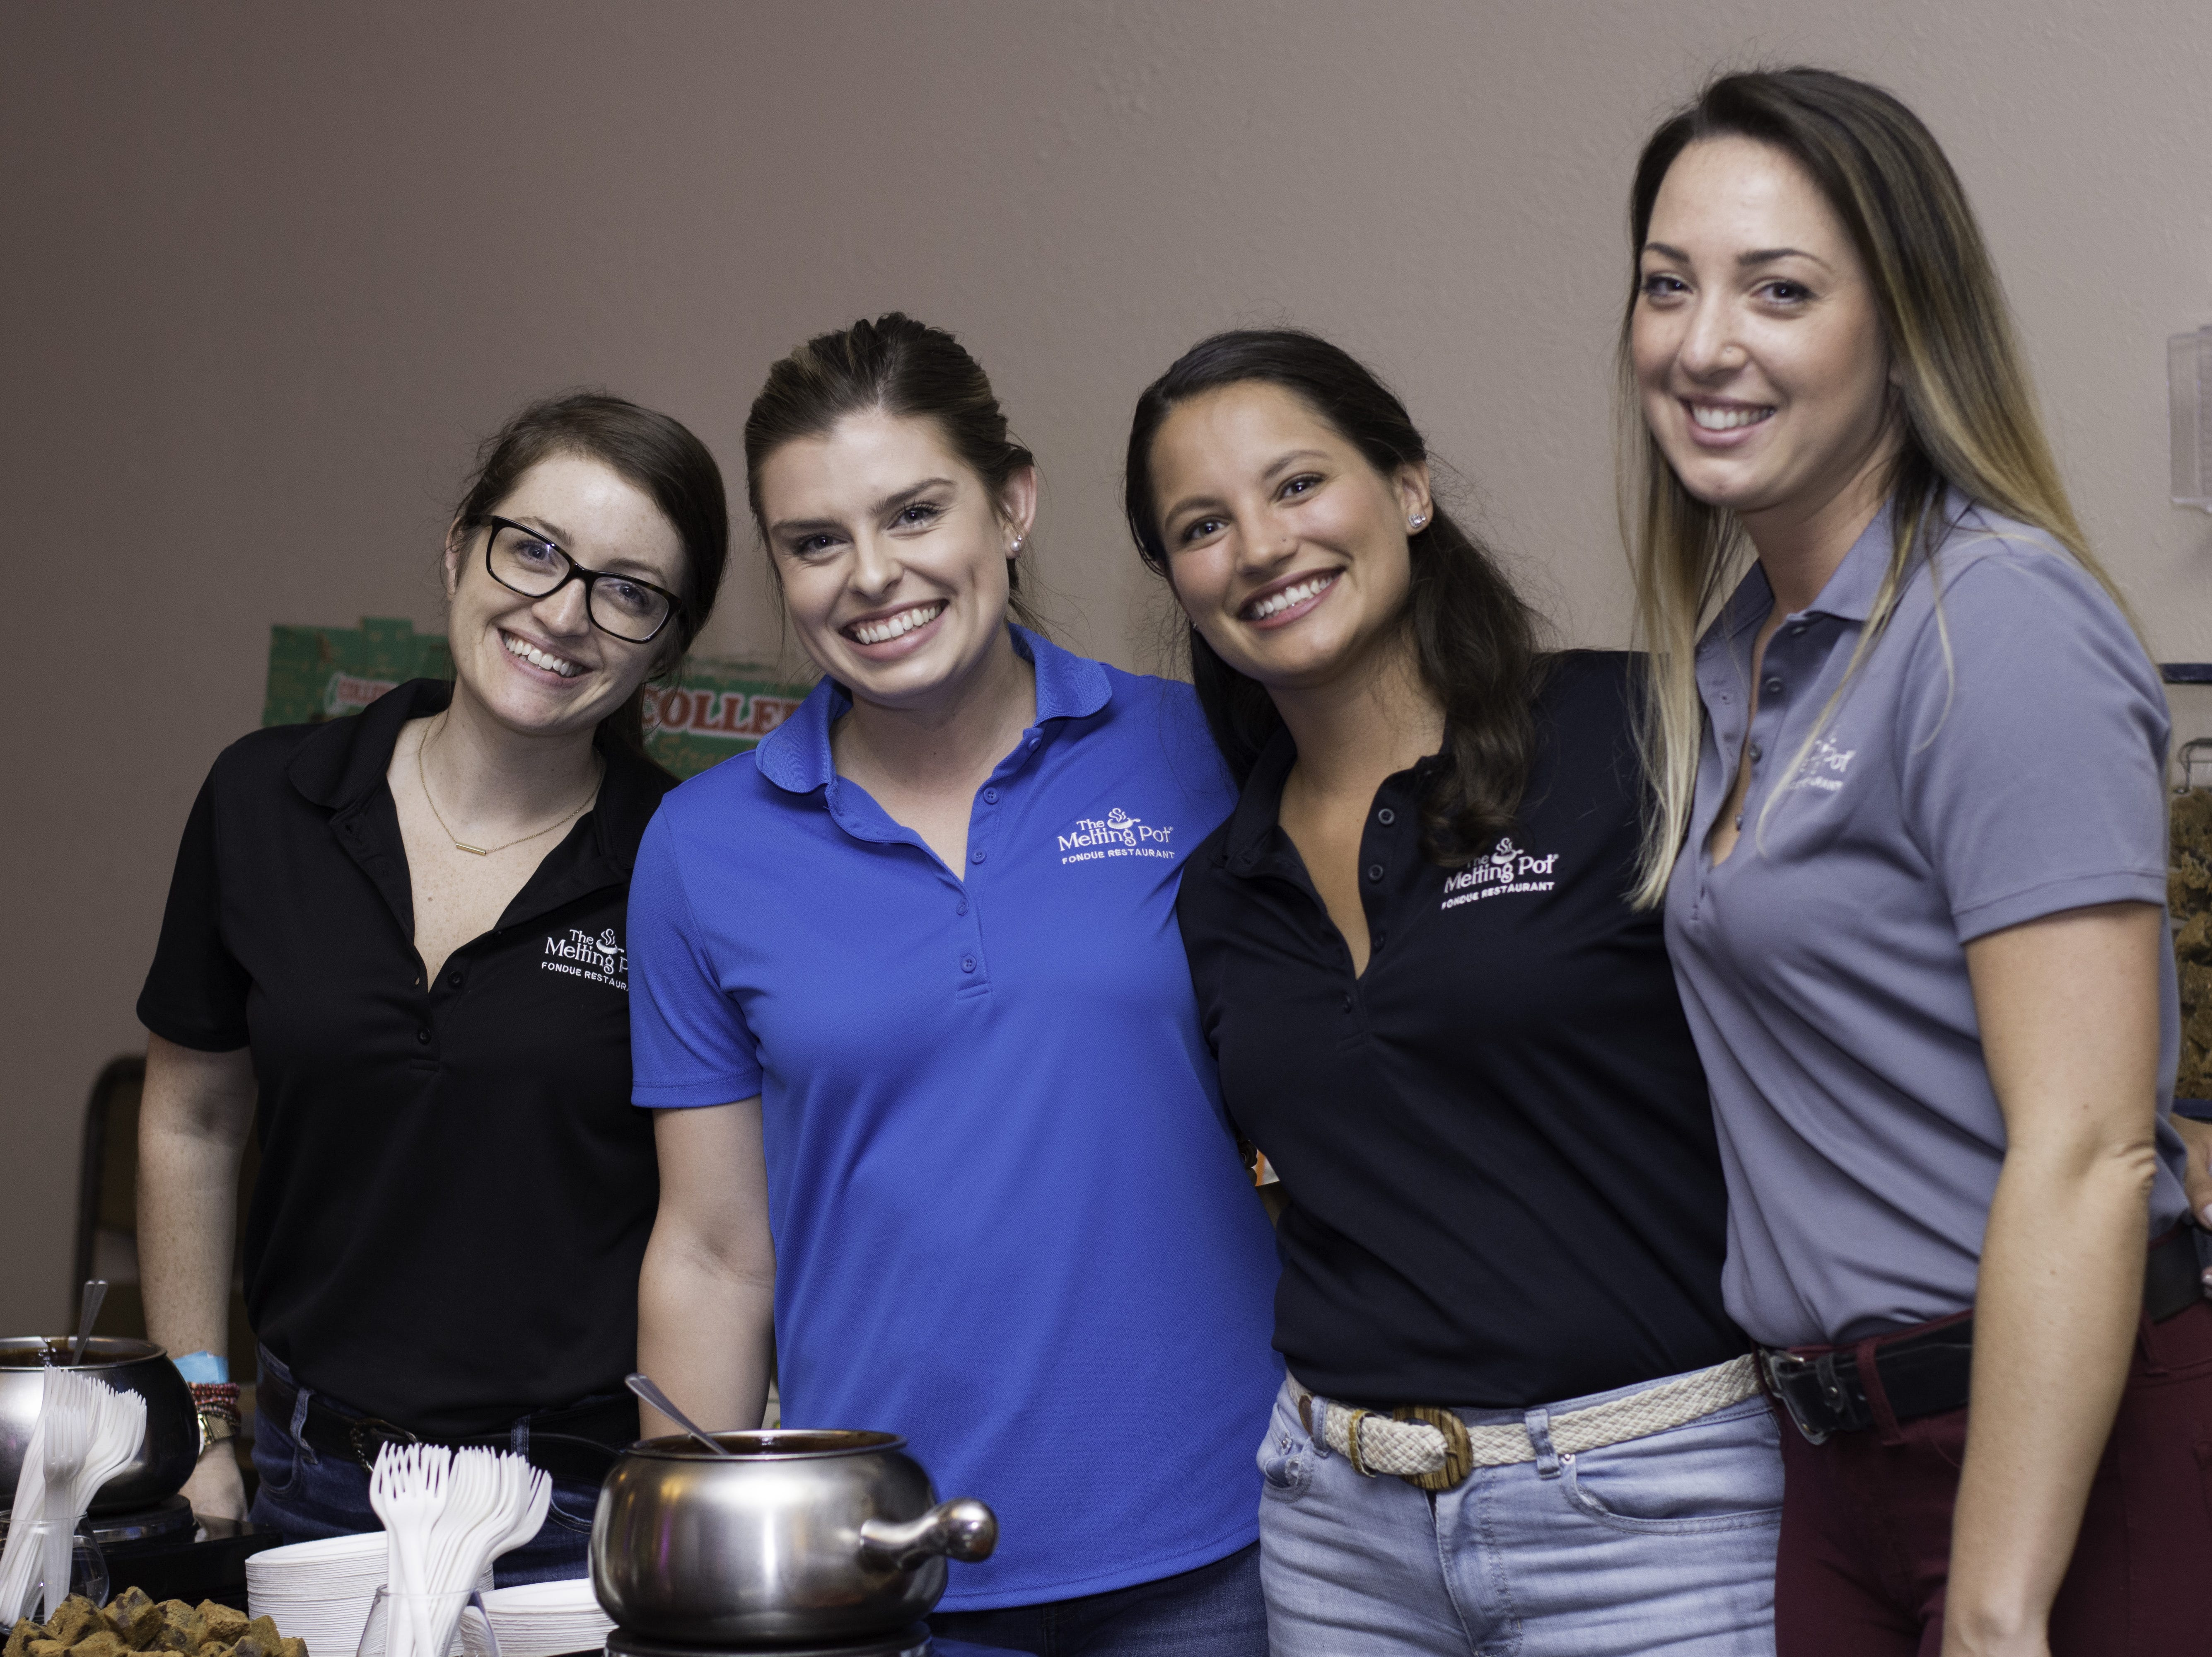 Melting Pot employees pose together at Jazzoo.